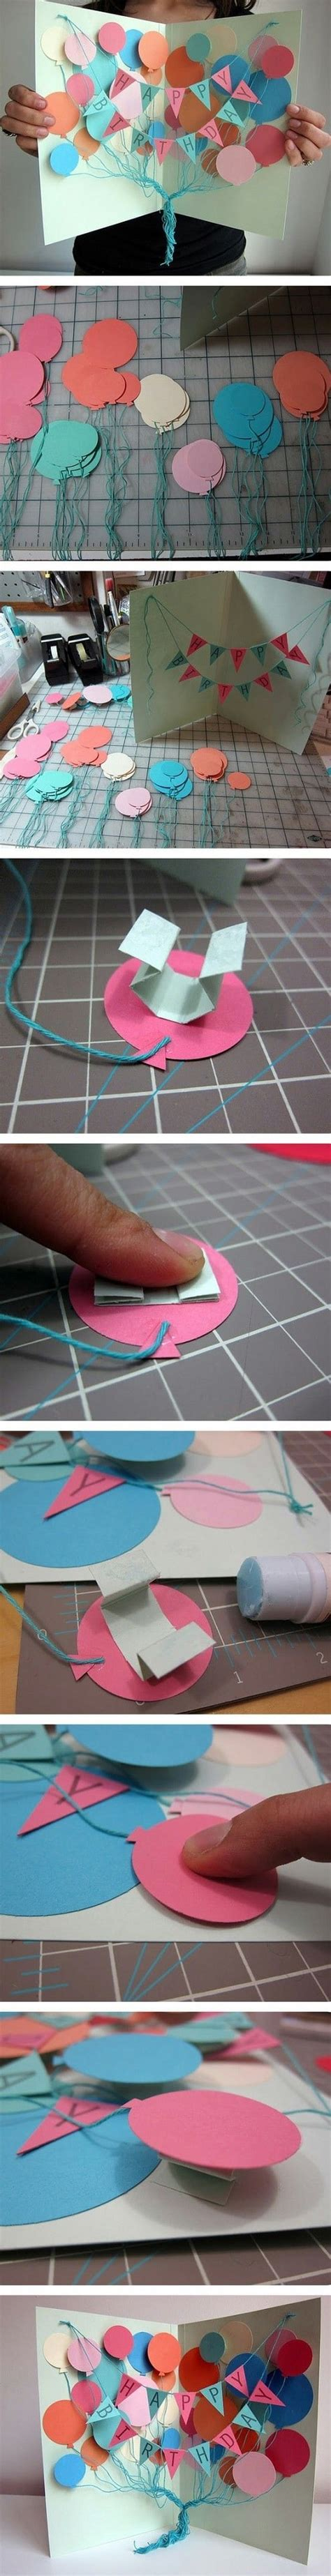 Handcrafted Birthday Card Ideas